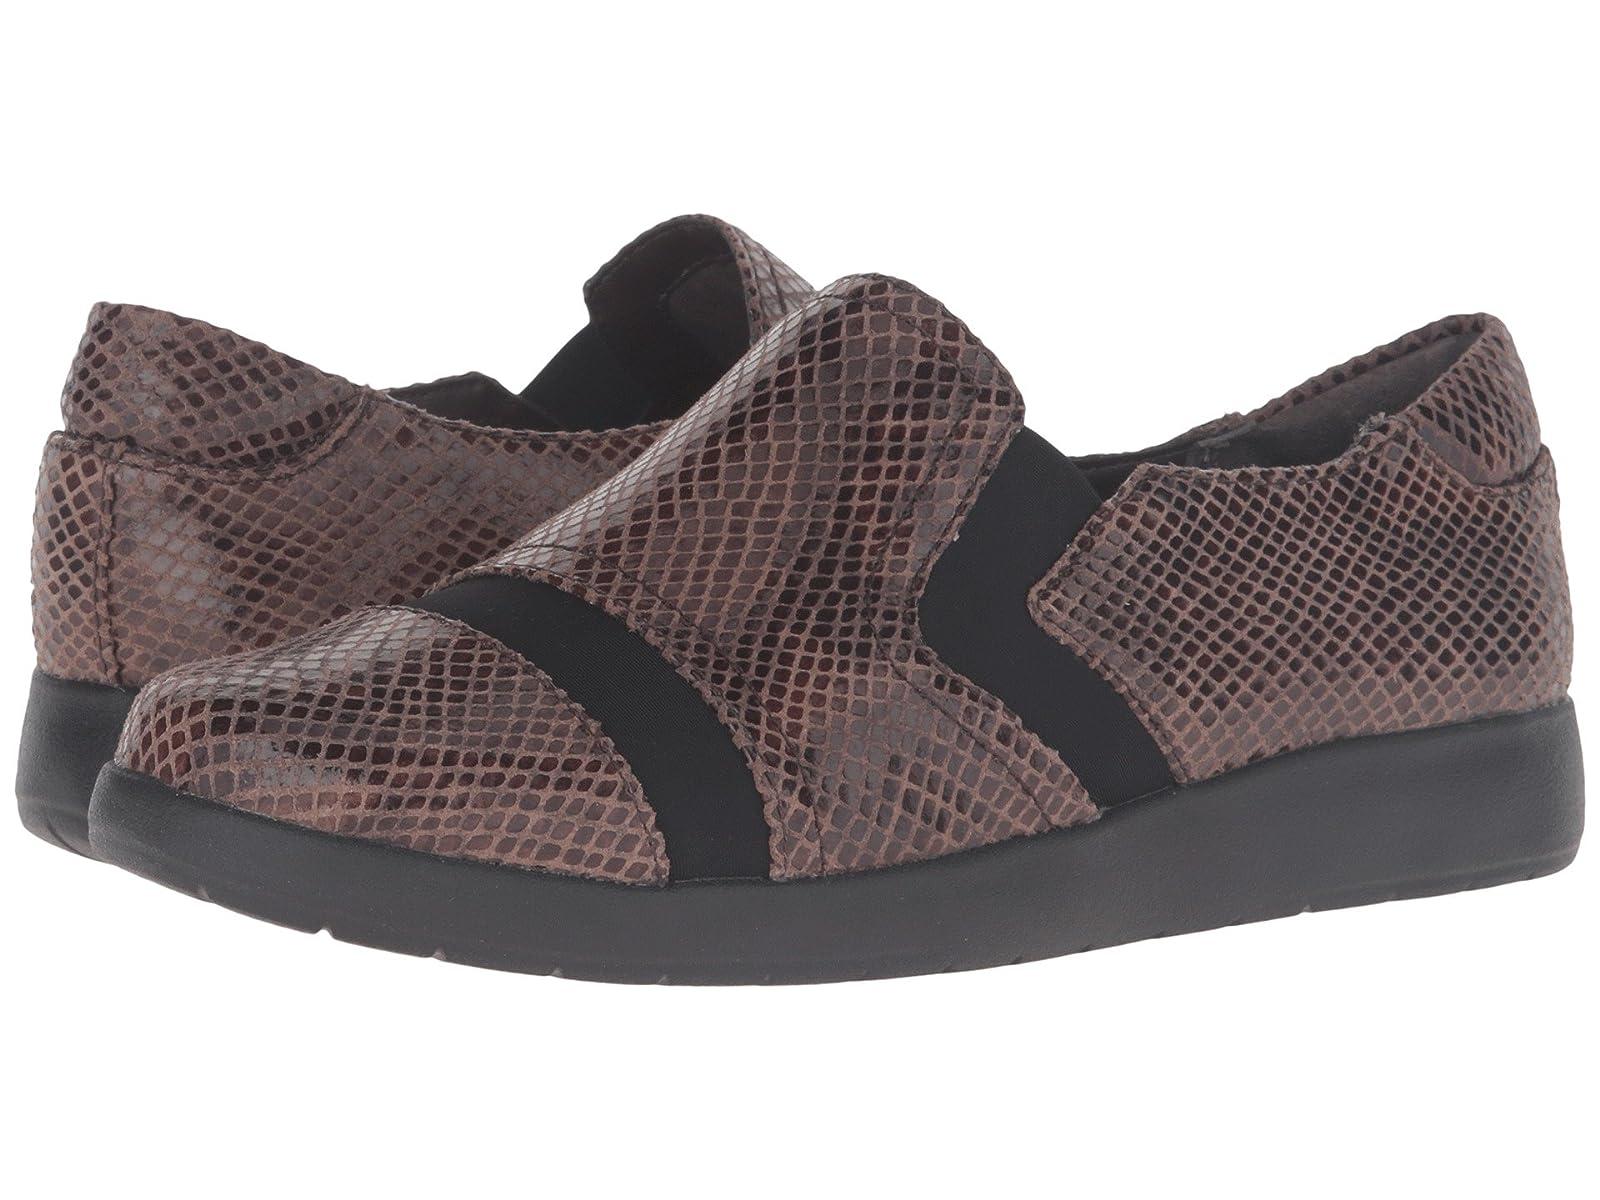 Rockport Devona DemsaCheap and distinctive eye-catching shoes